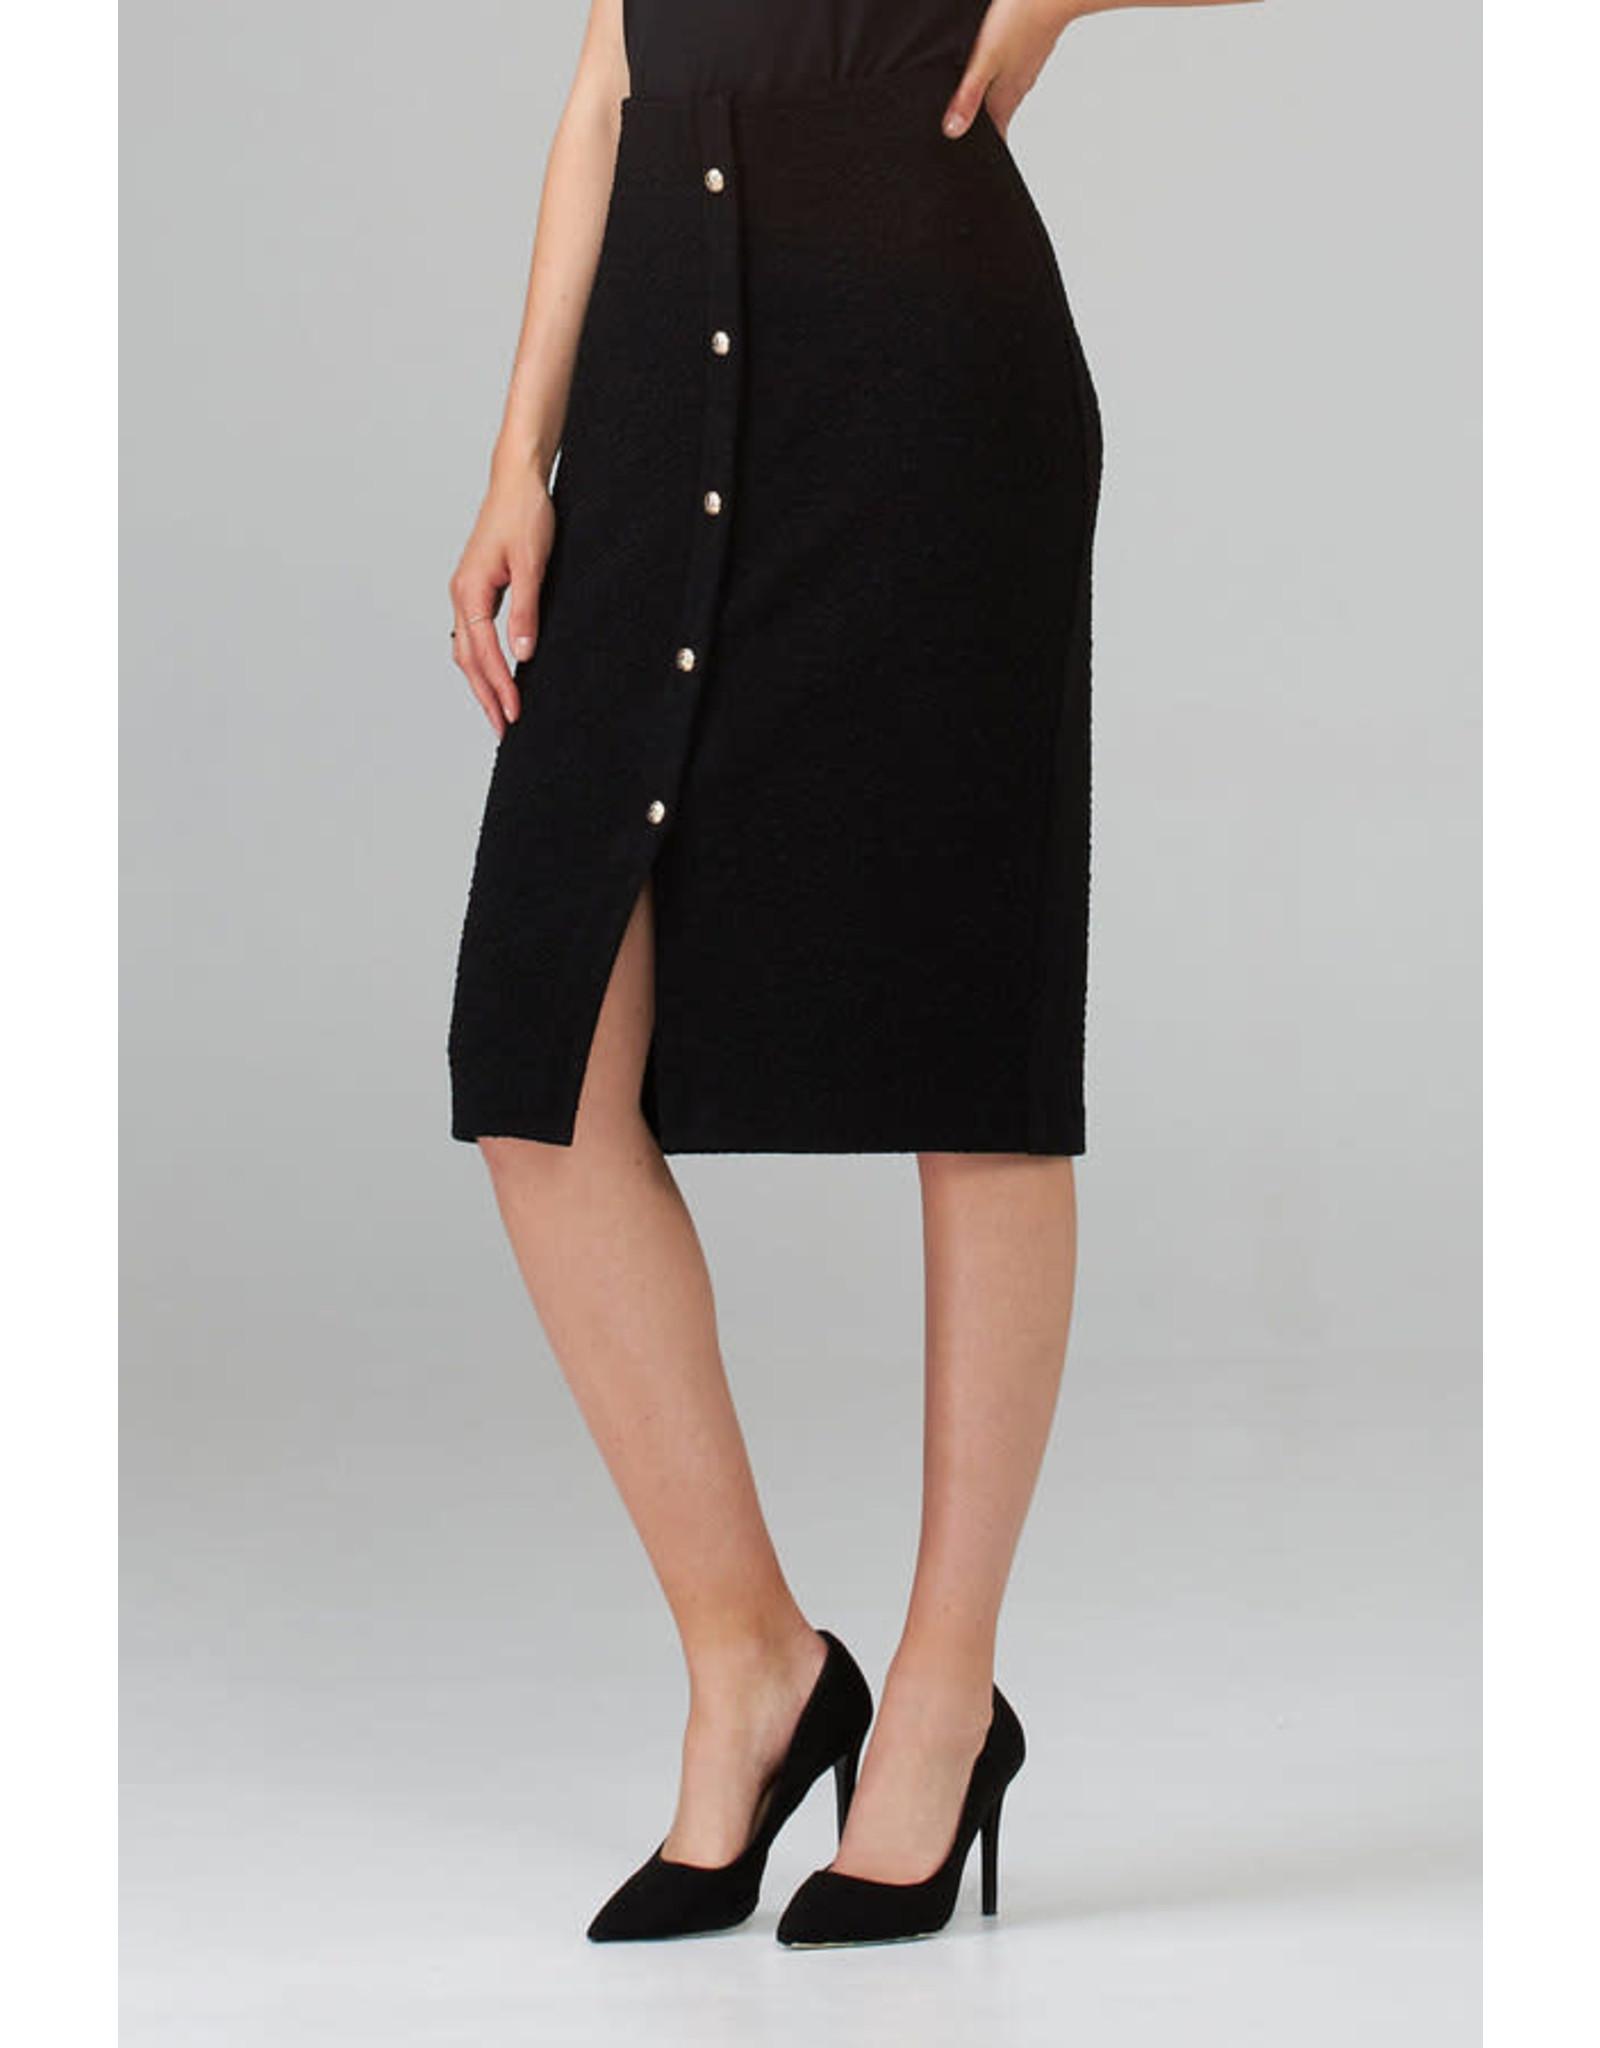 Joseph Ribkoff Black Boucle Skirt